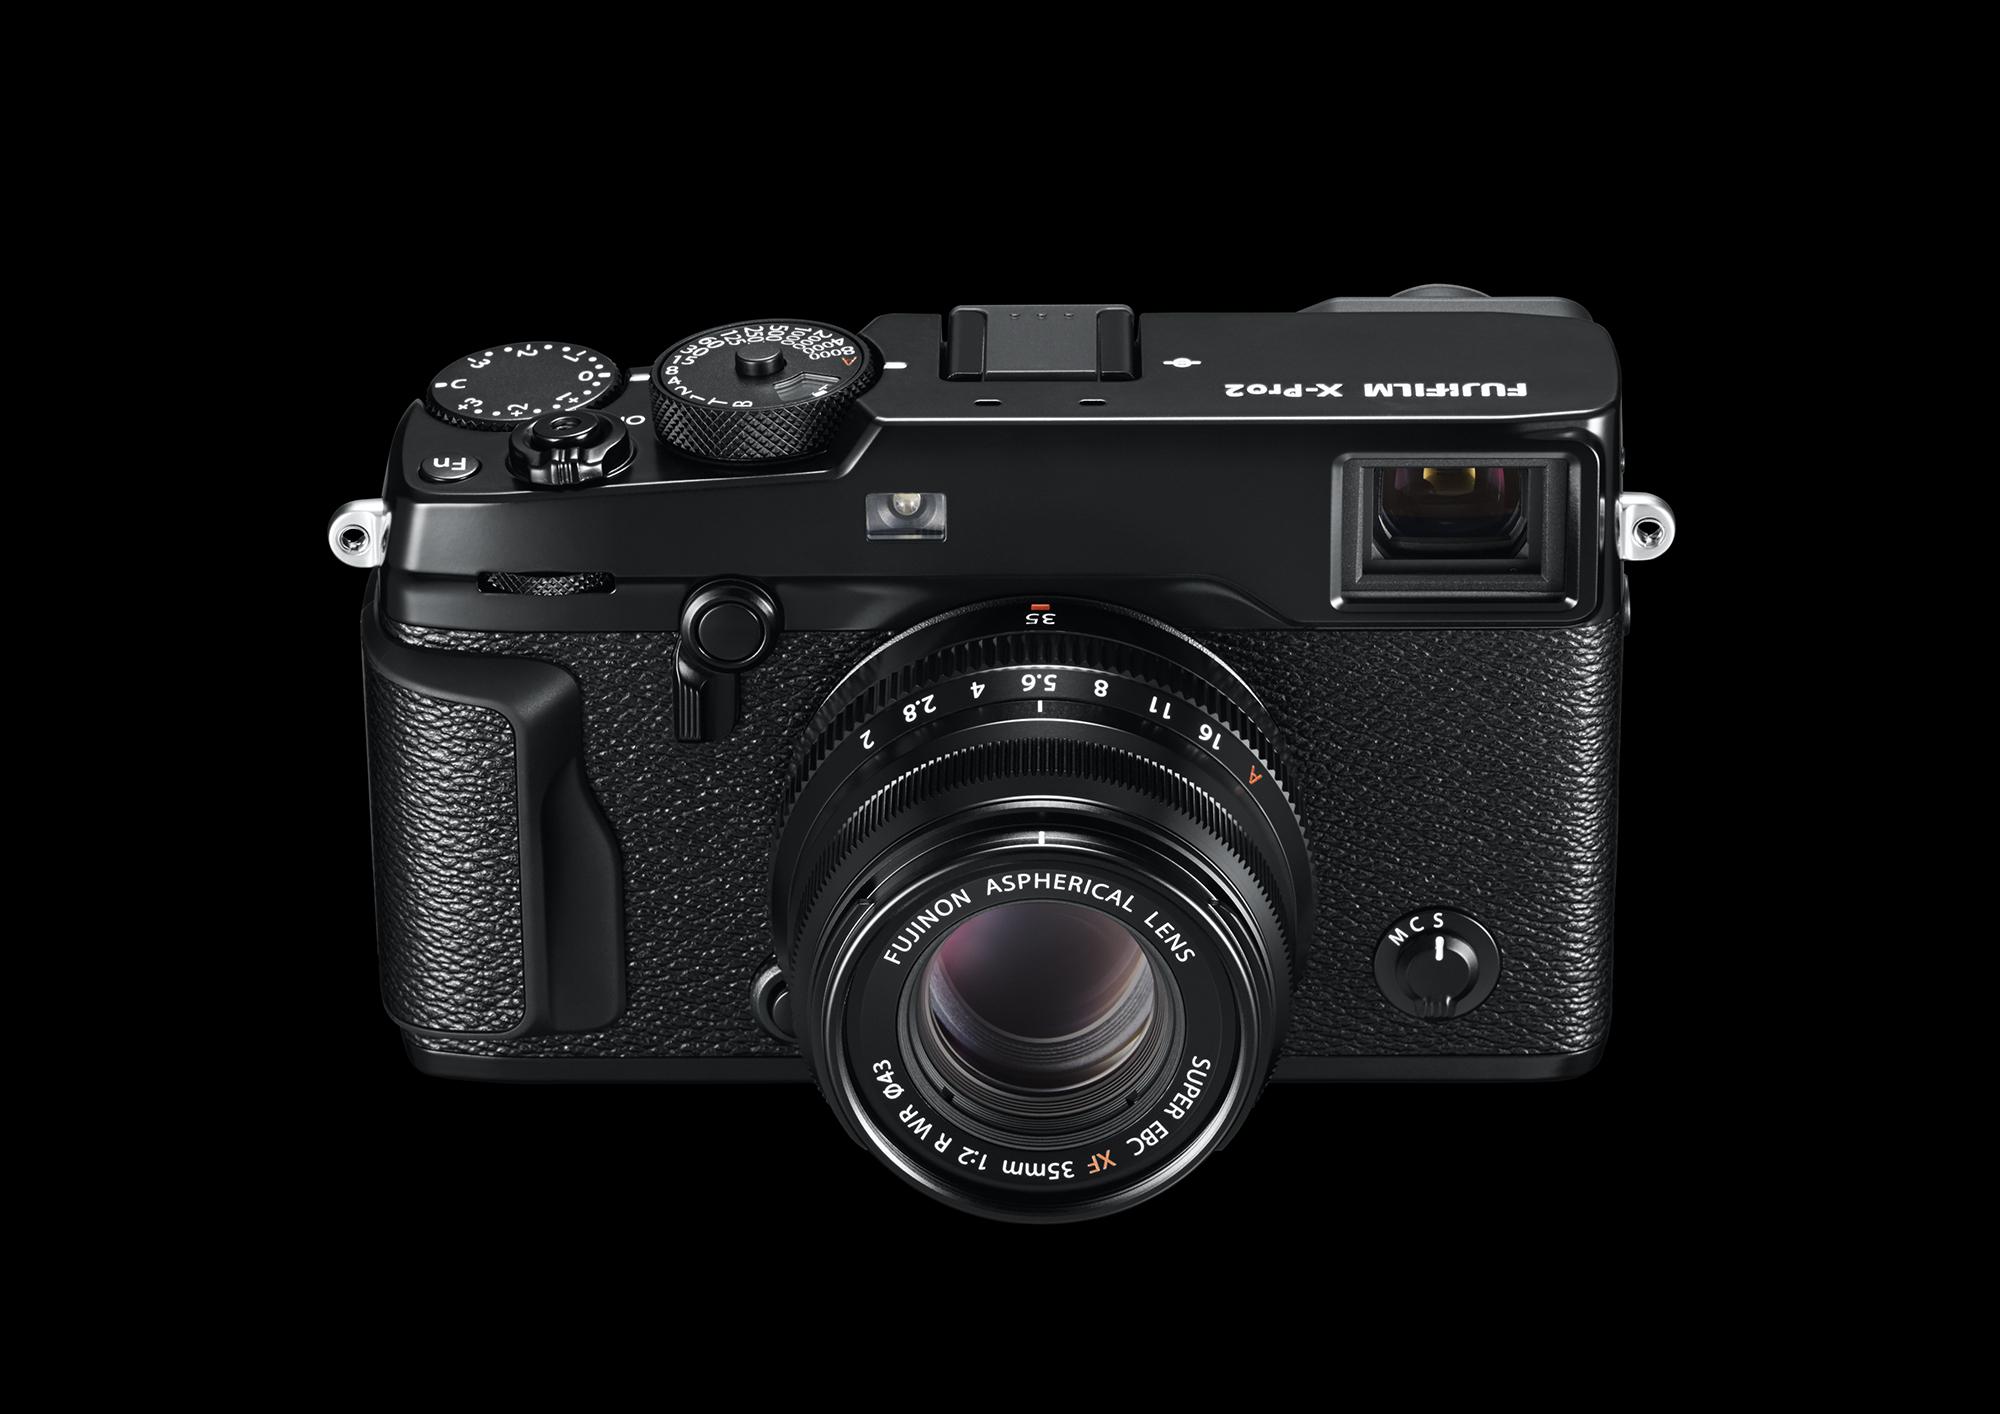 39208763_05_x-pro2_bk_front_top_35mm_black.jpg